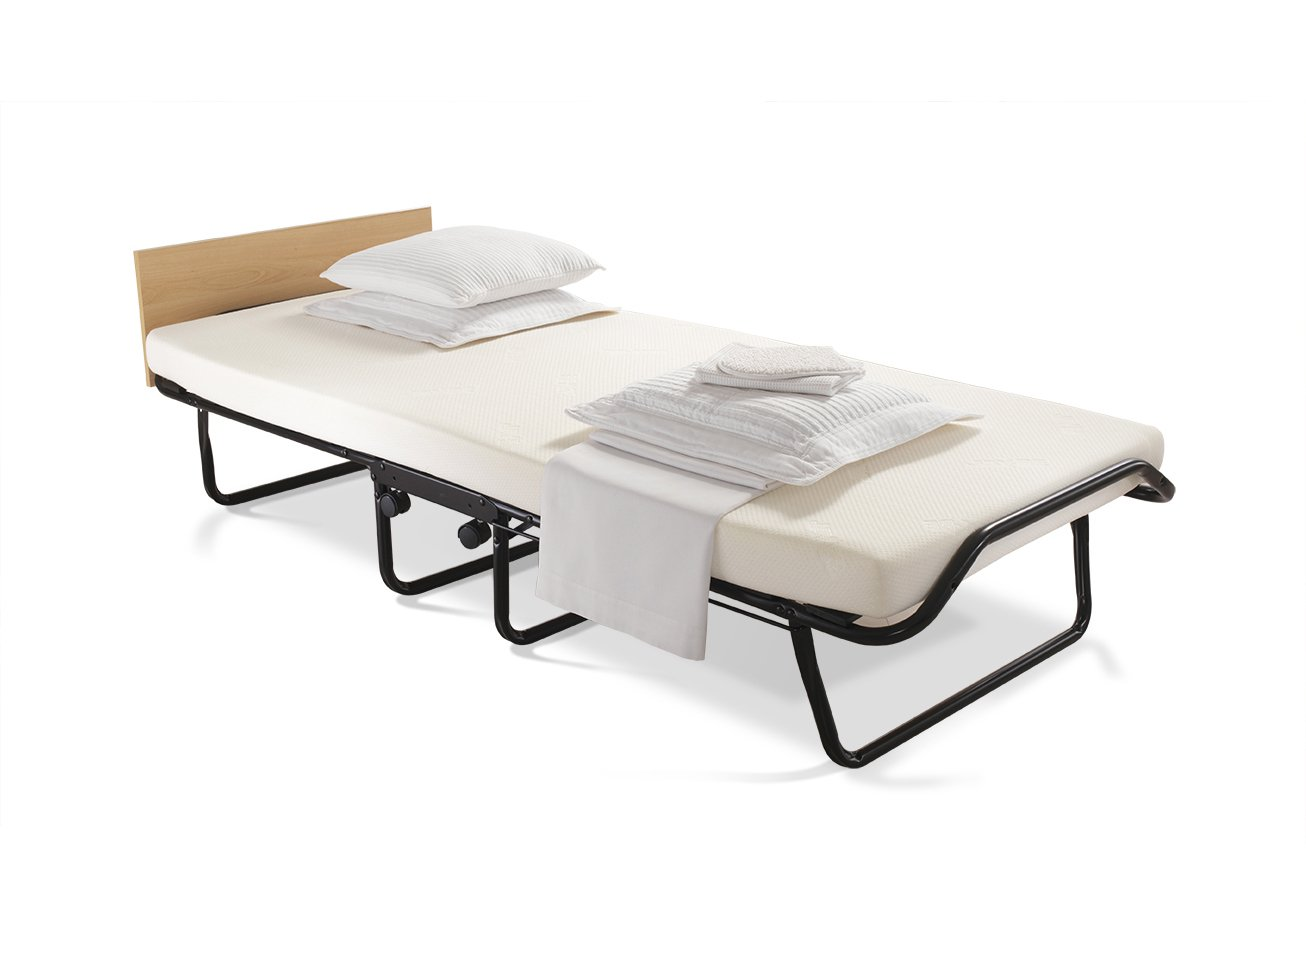 JAY-BE Impression Folding Bed and Memory Foam Mattress, Single 105810